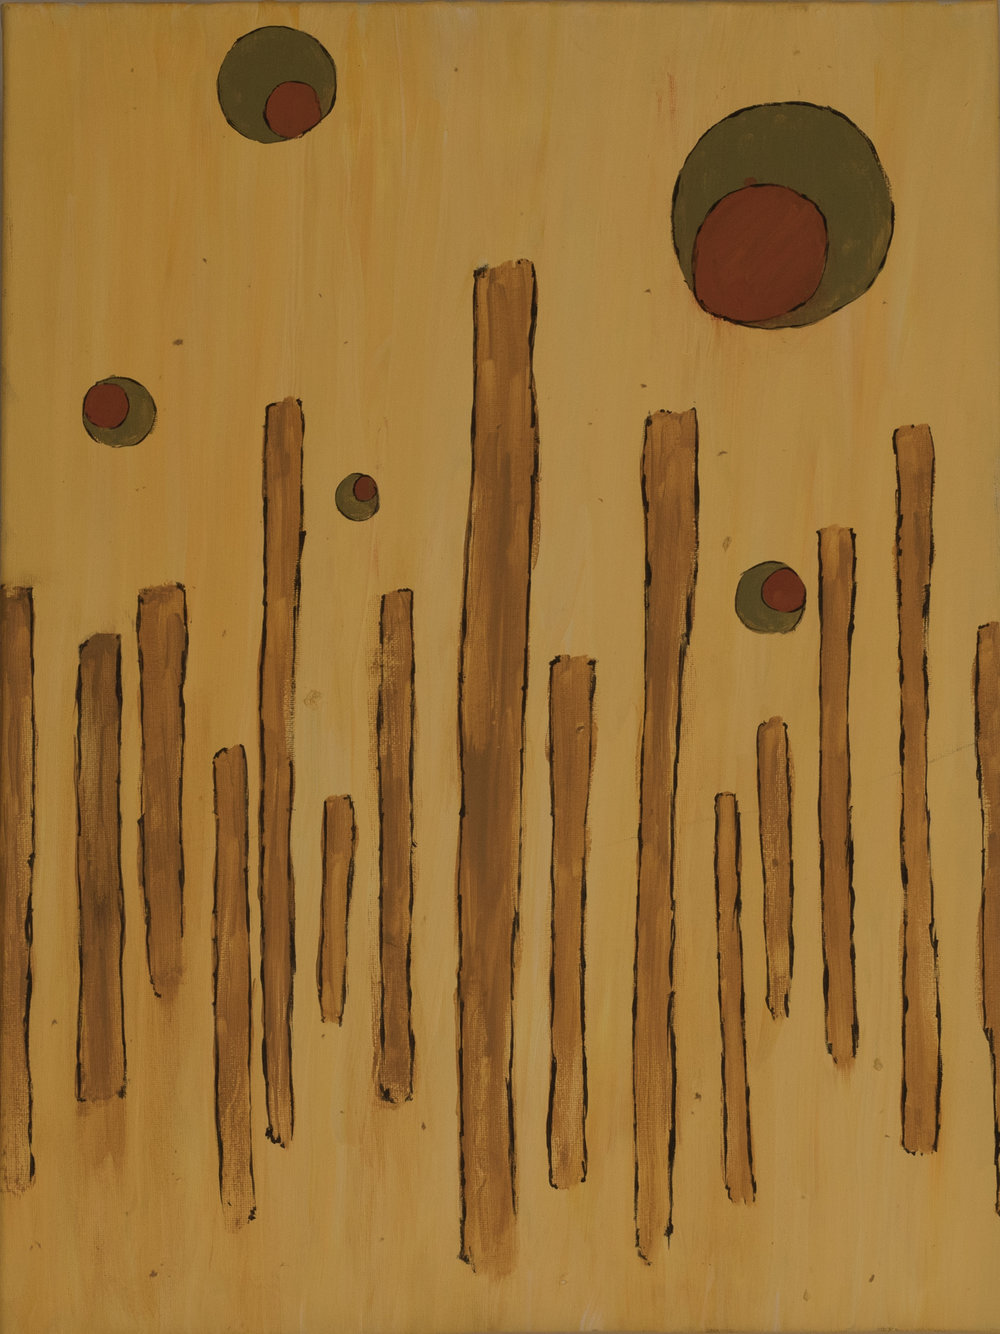 olives and sticks.jpg